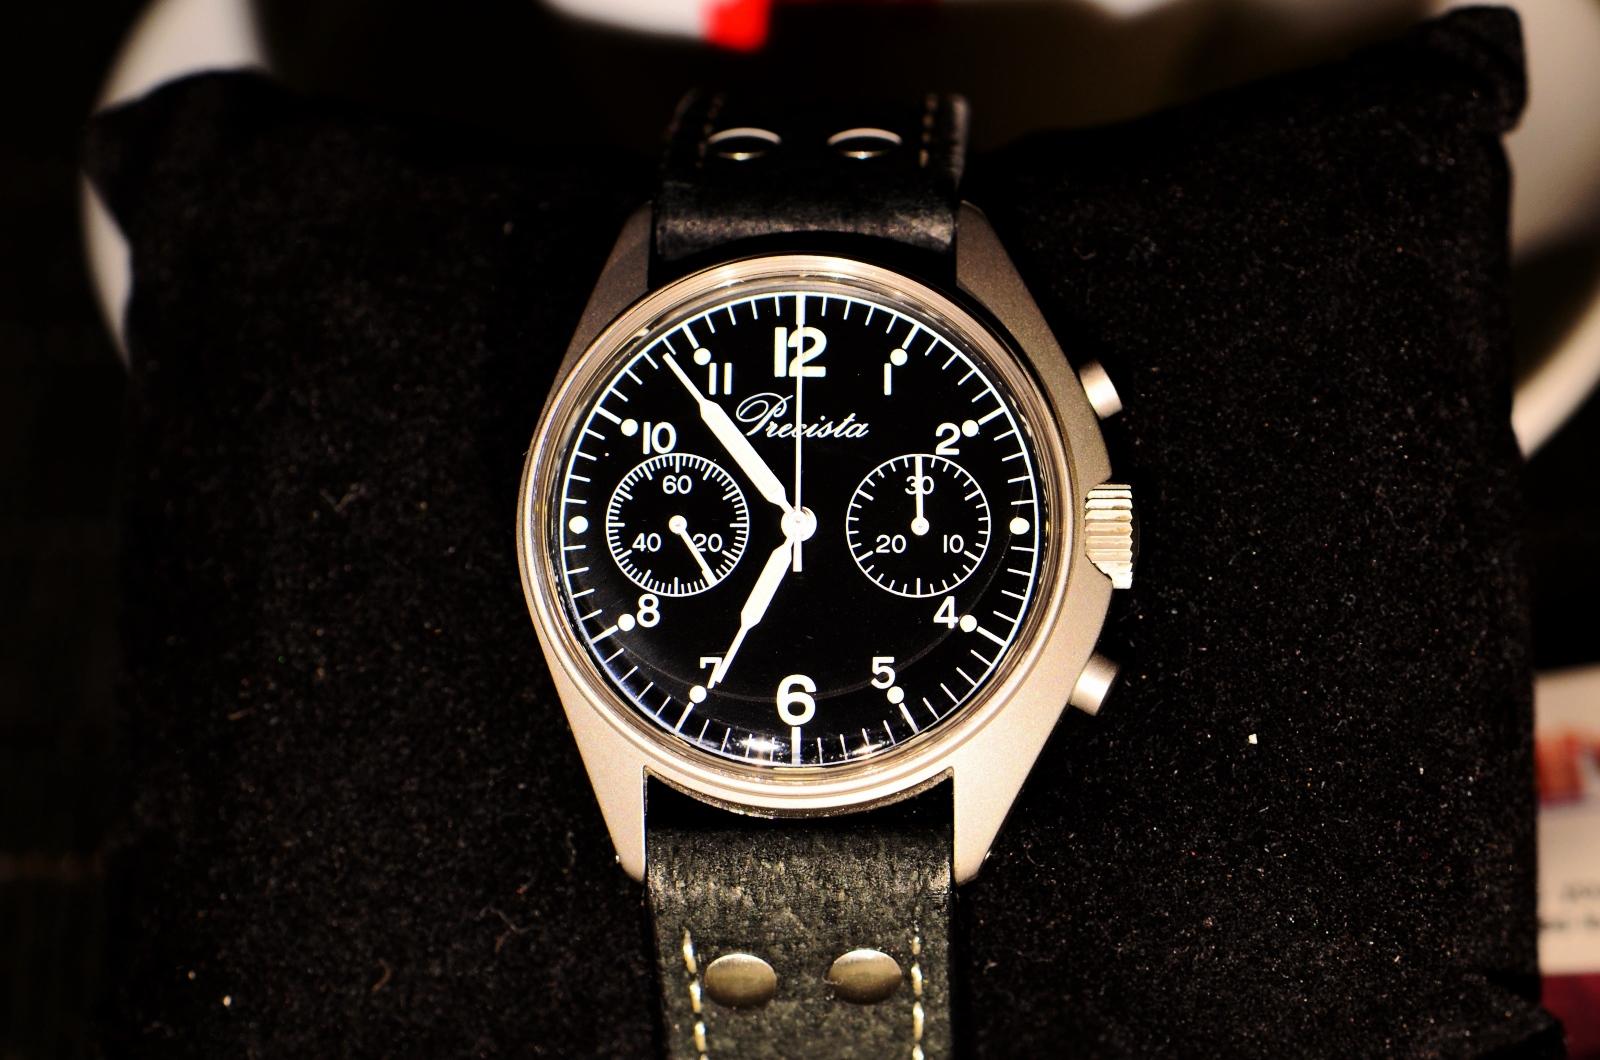 Erledigt] Precista PRS-5 Chronograph - UhrForum